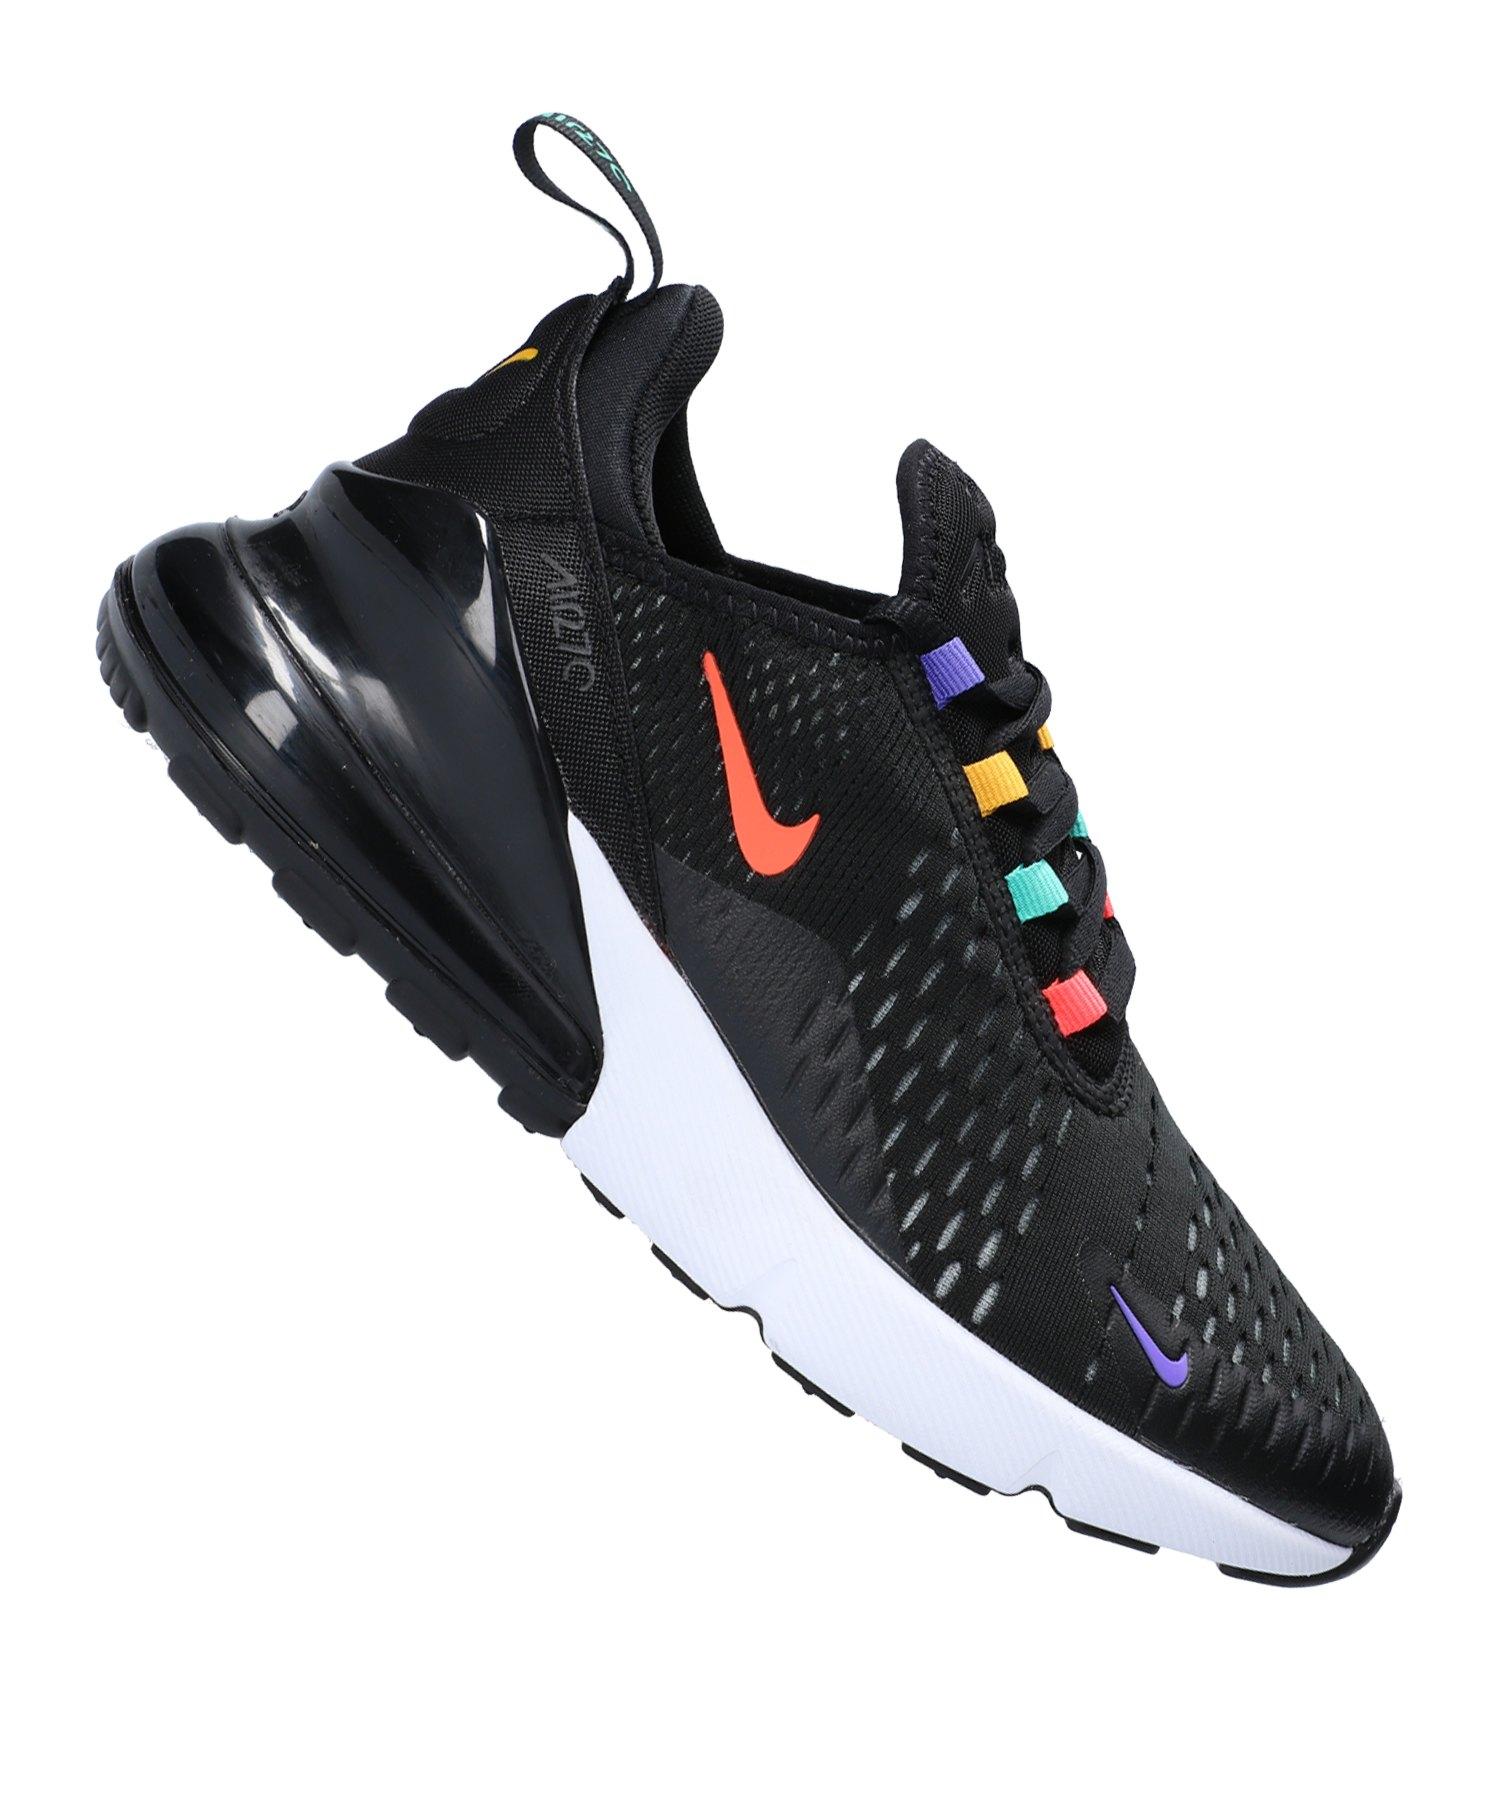 Nike Air Max 270 Sneaker Damen Grau F023 |Lifestyle | Freizeit ...